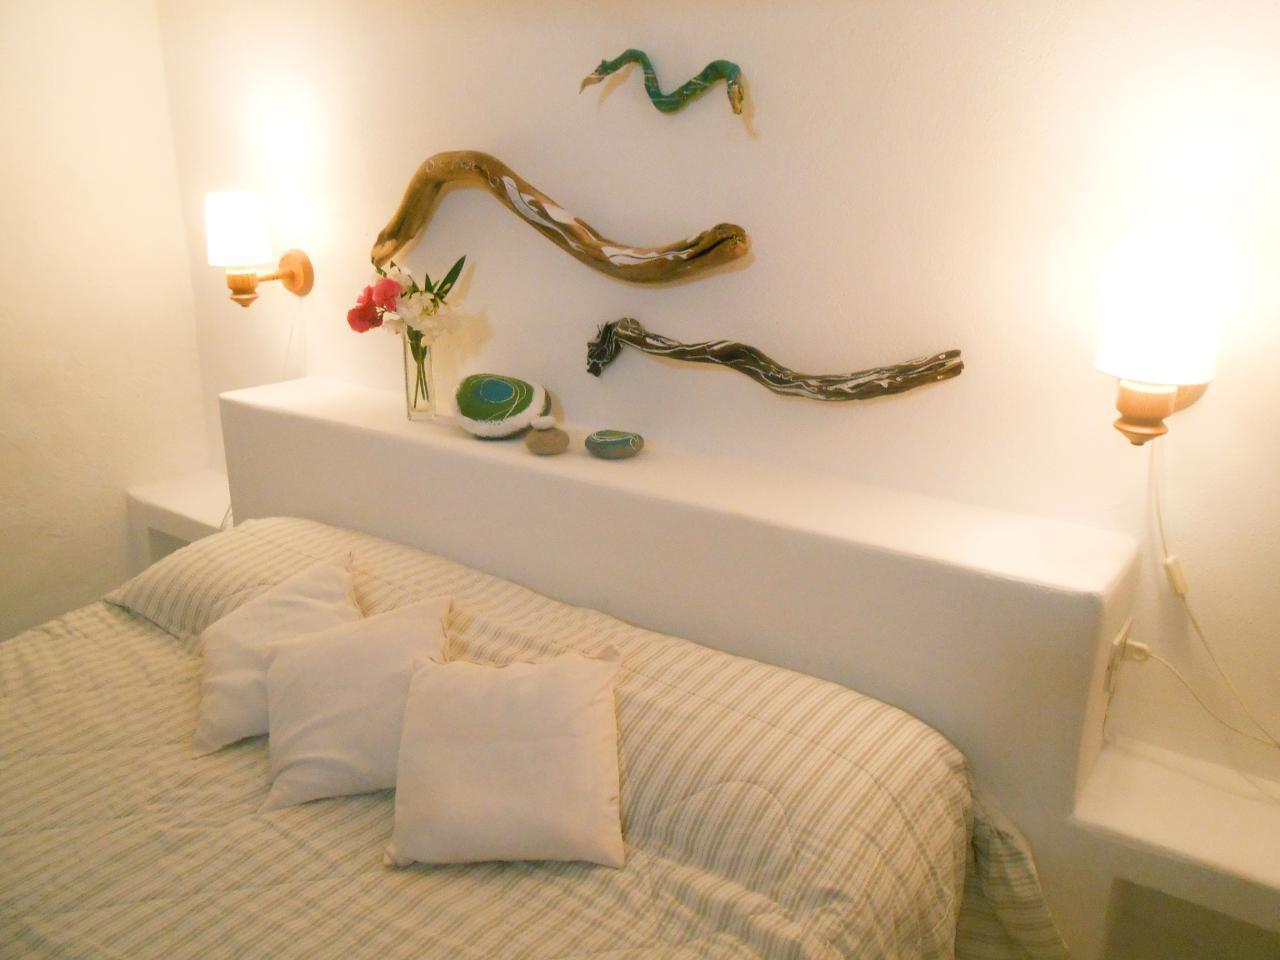 Maison de vacances Ferienhaushälfte Oleandro auf sizilianischer Insel mit atemberaubenden Meeres-Rundblick (2045159), Lipari, Lipari, Sicile, Italie, image 25